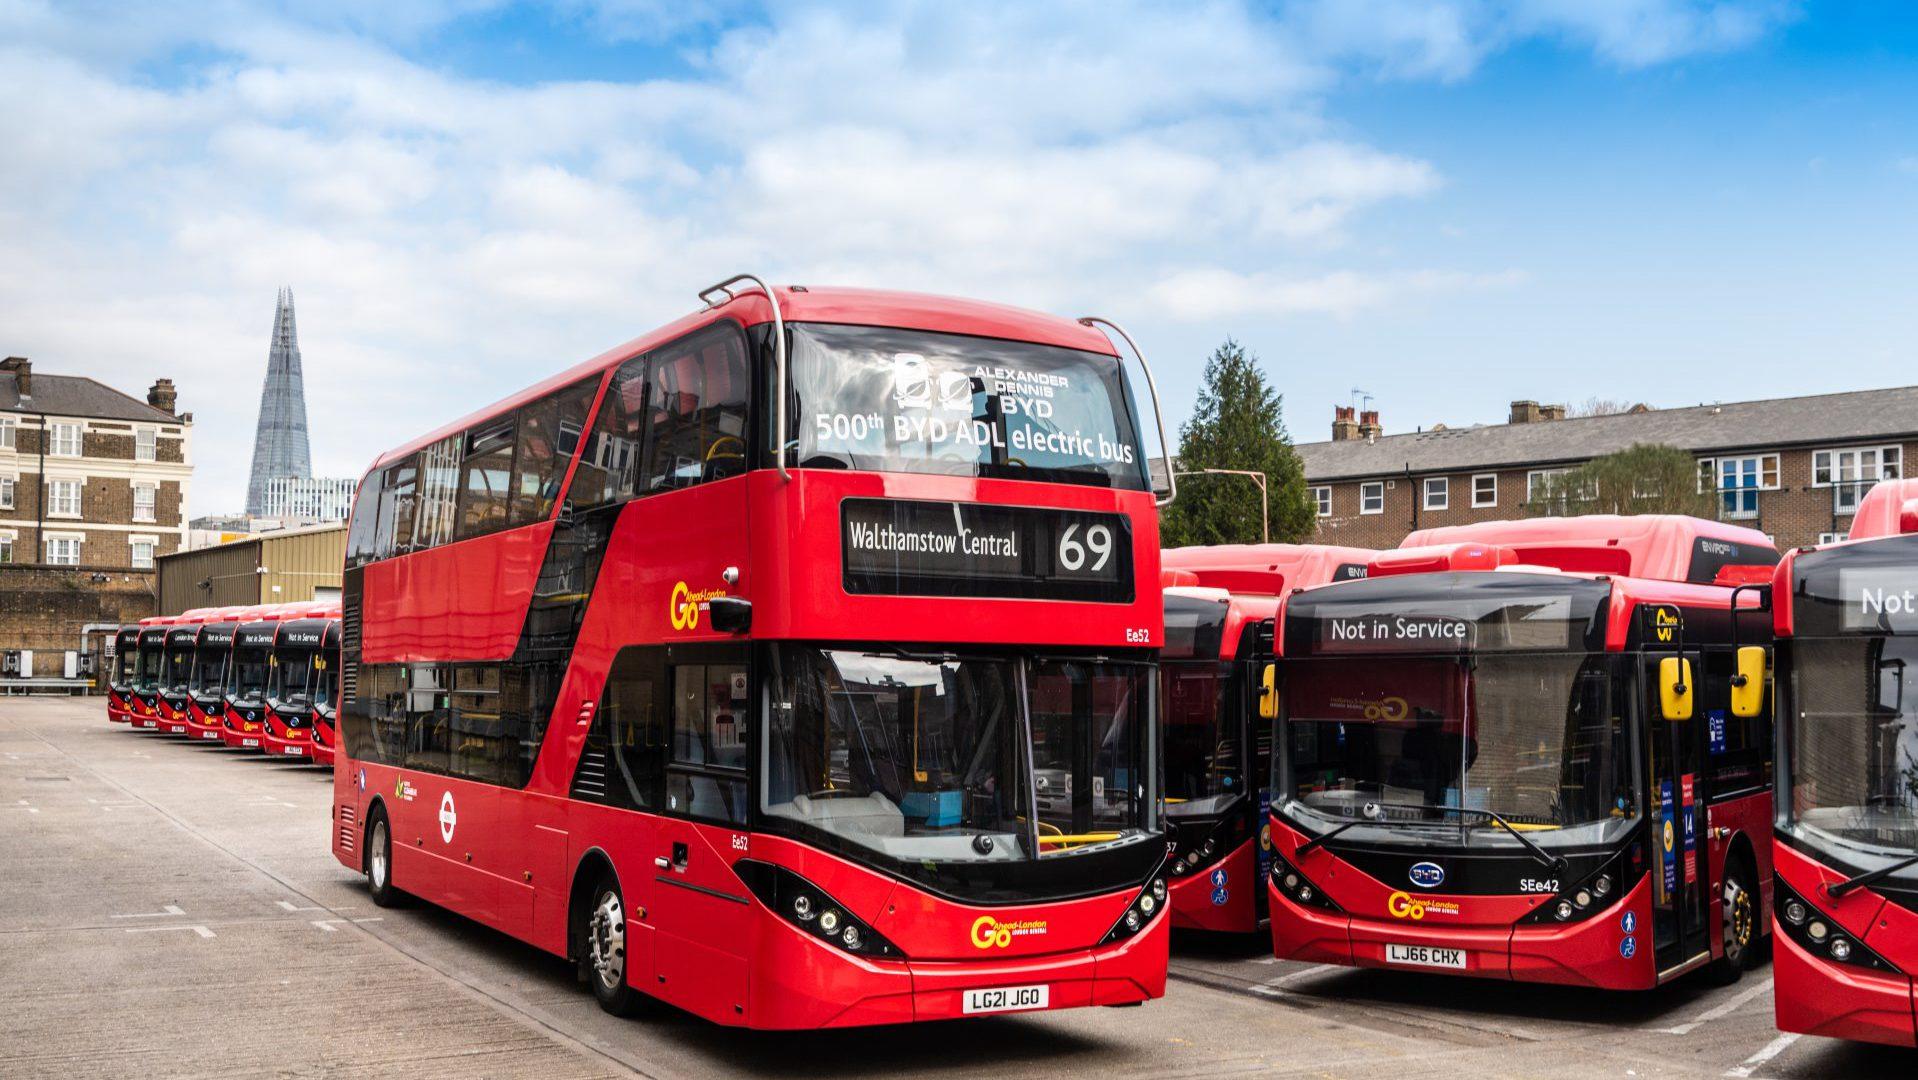 500 byd adl electric bus